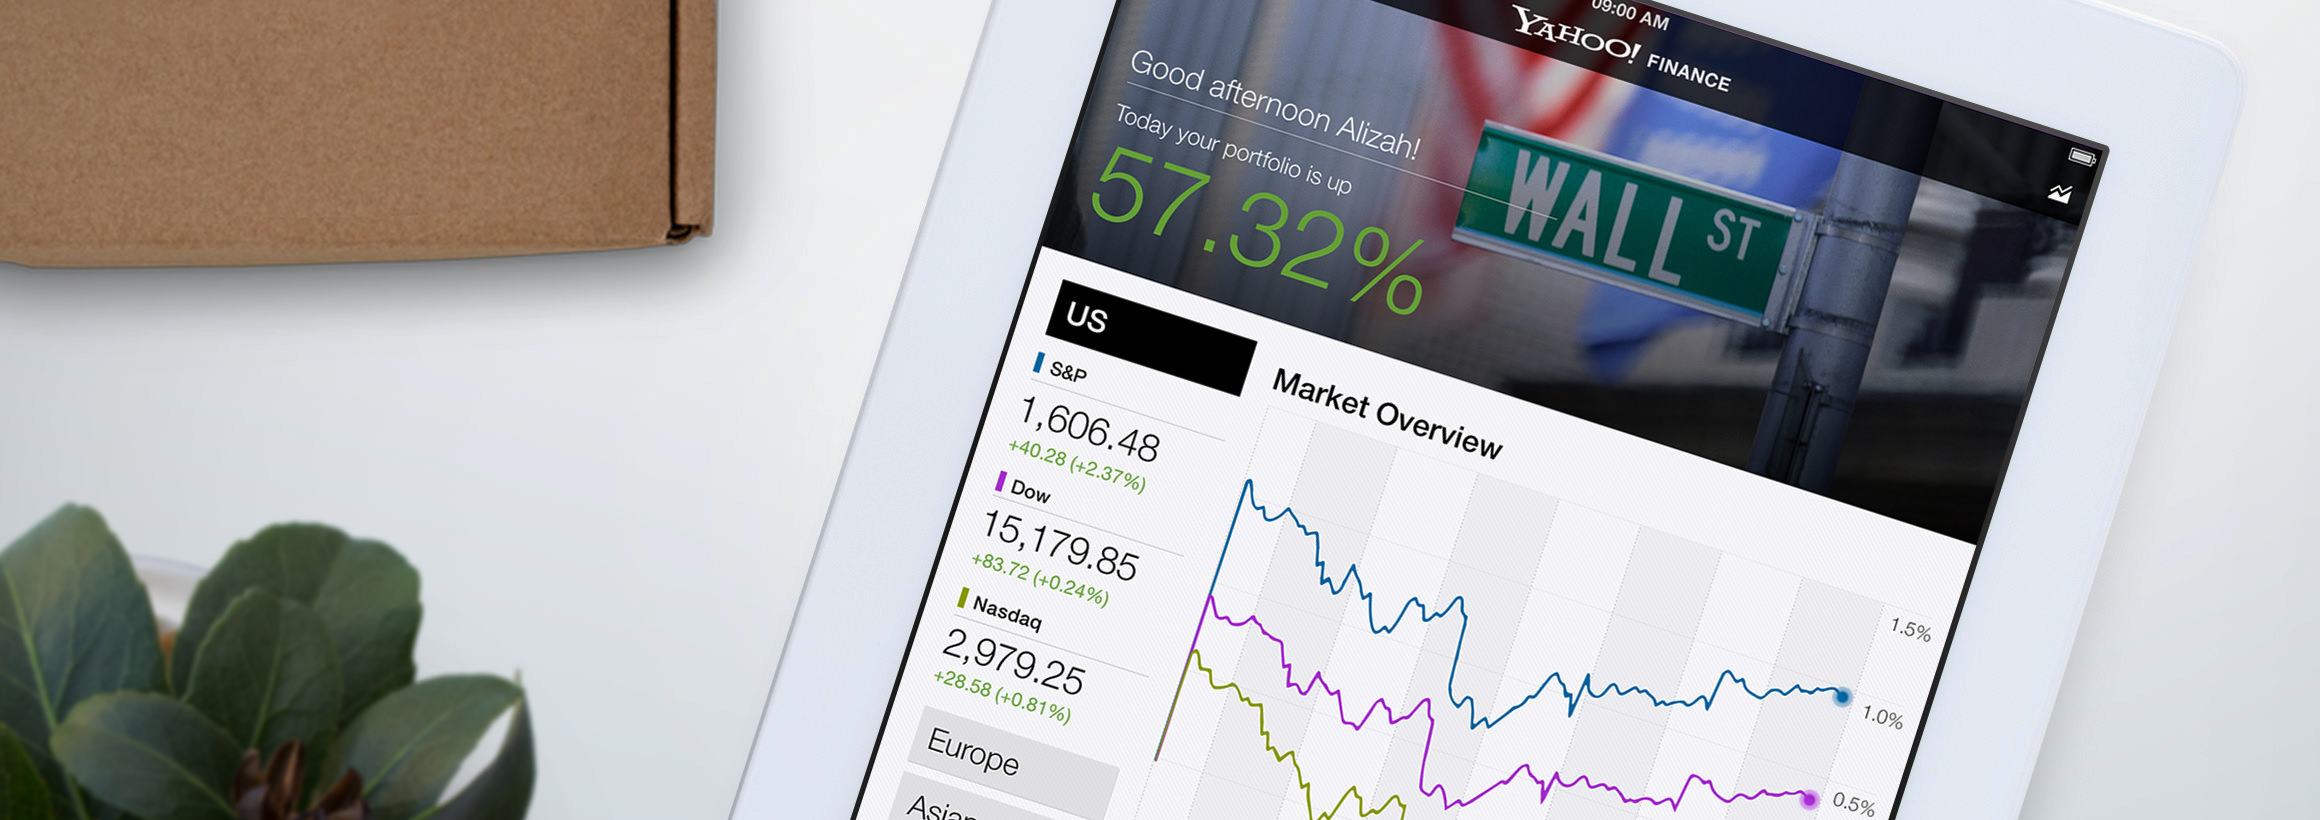 Yahoo! Financefor iPad - Product Strategy, Ui/ux Design